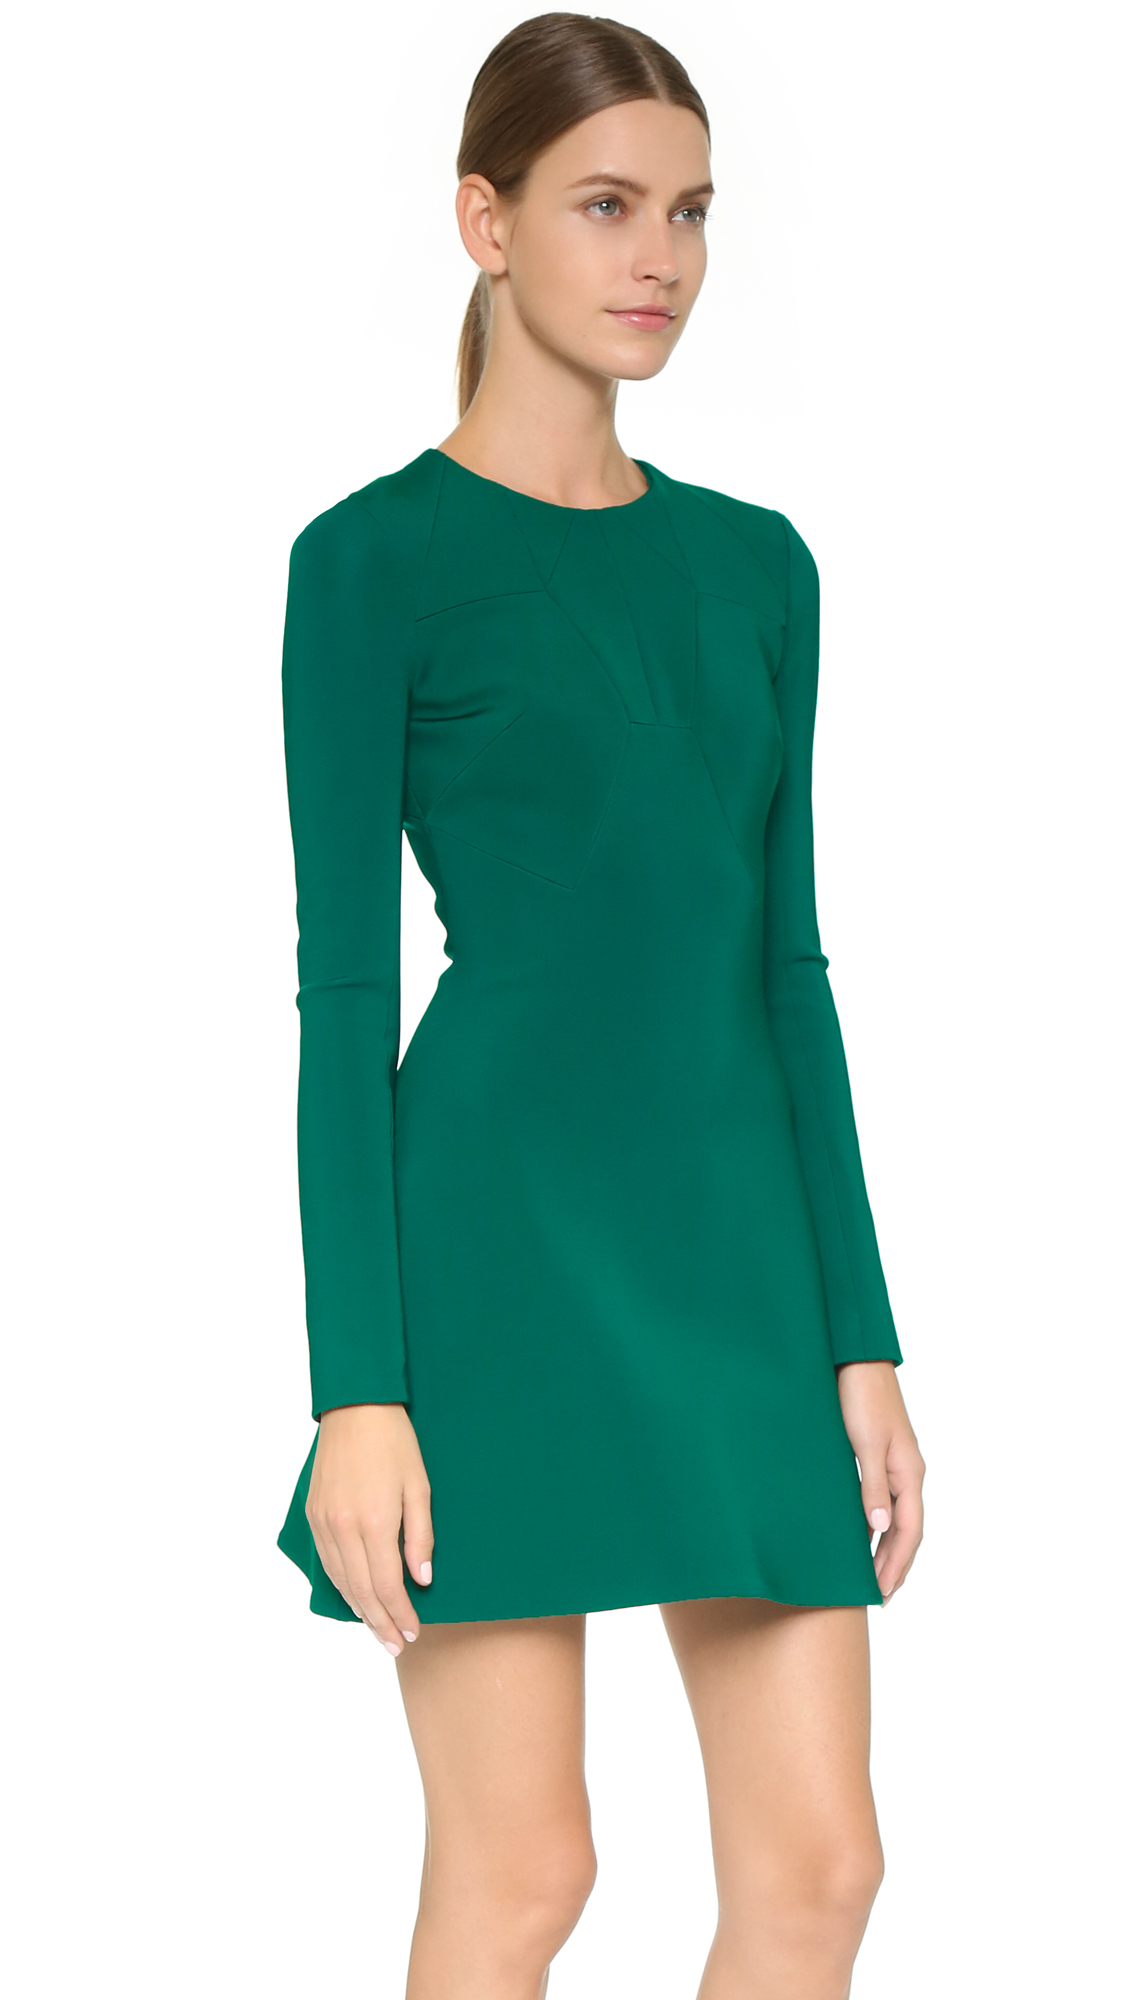 Sneakernews Sale Online DRESSES - 3/4 length dresses Cushnie et Ochs Free Shipping Release Dates Sale Best Seller Outlet 2018 New Outlet Shopping Online zMNBWk0